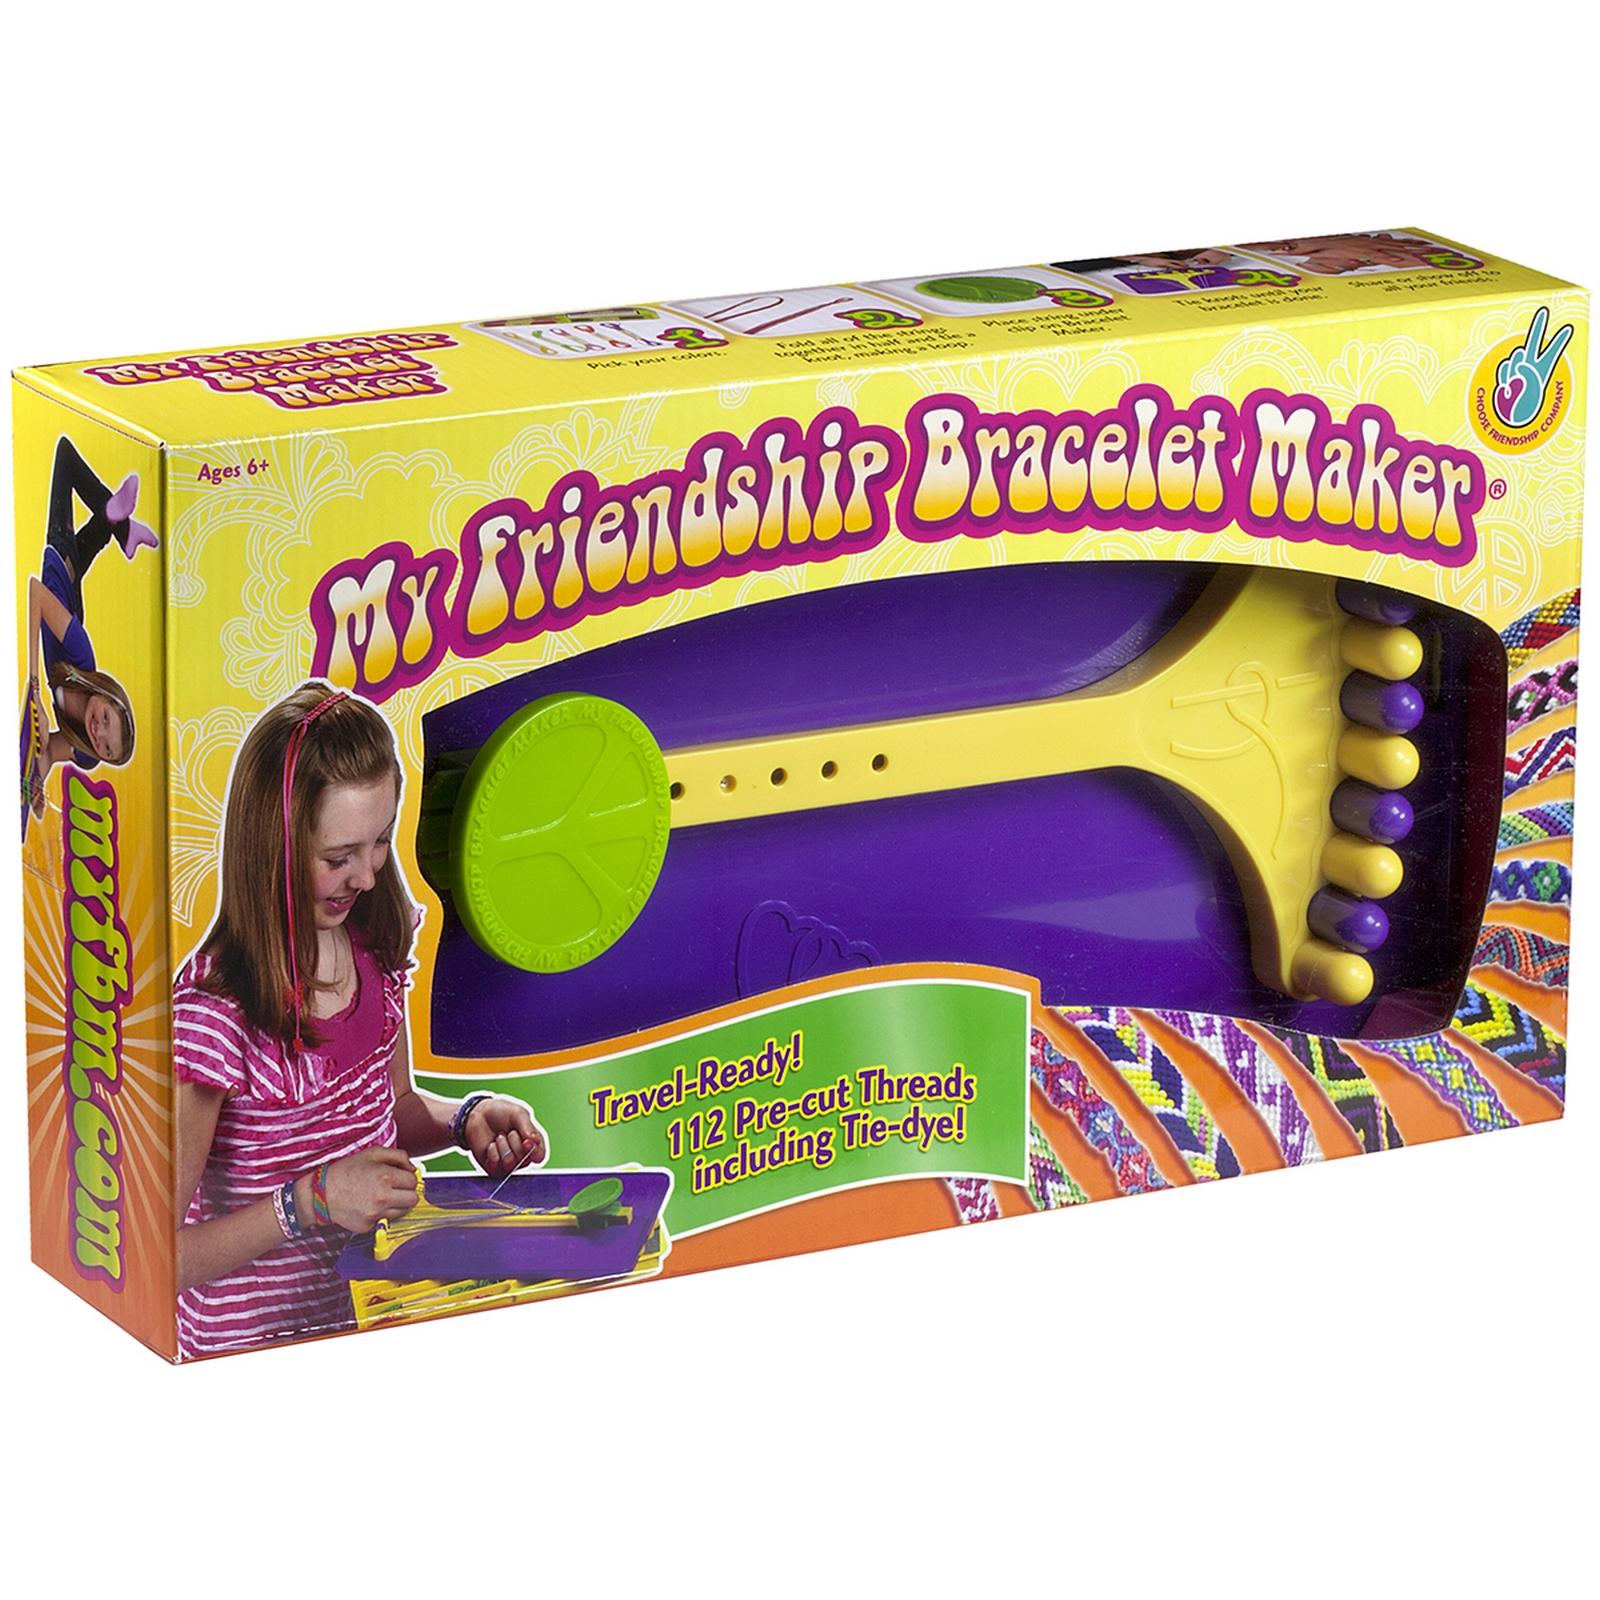 Crorey Creations My Friendship Bracelet Maker Kit